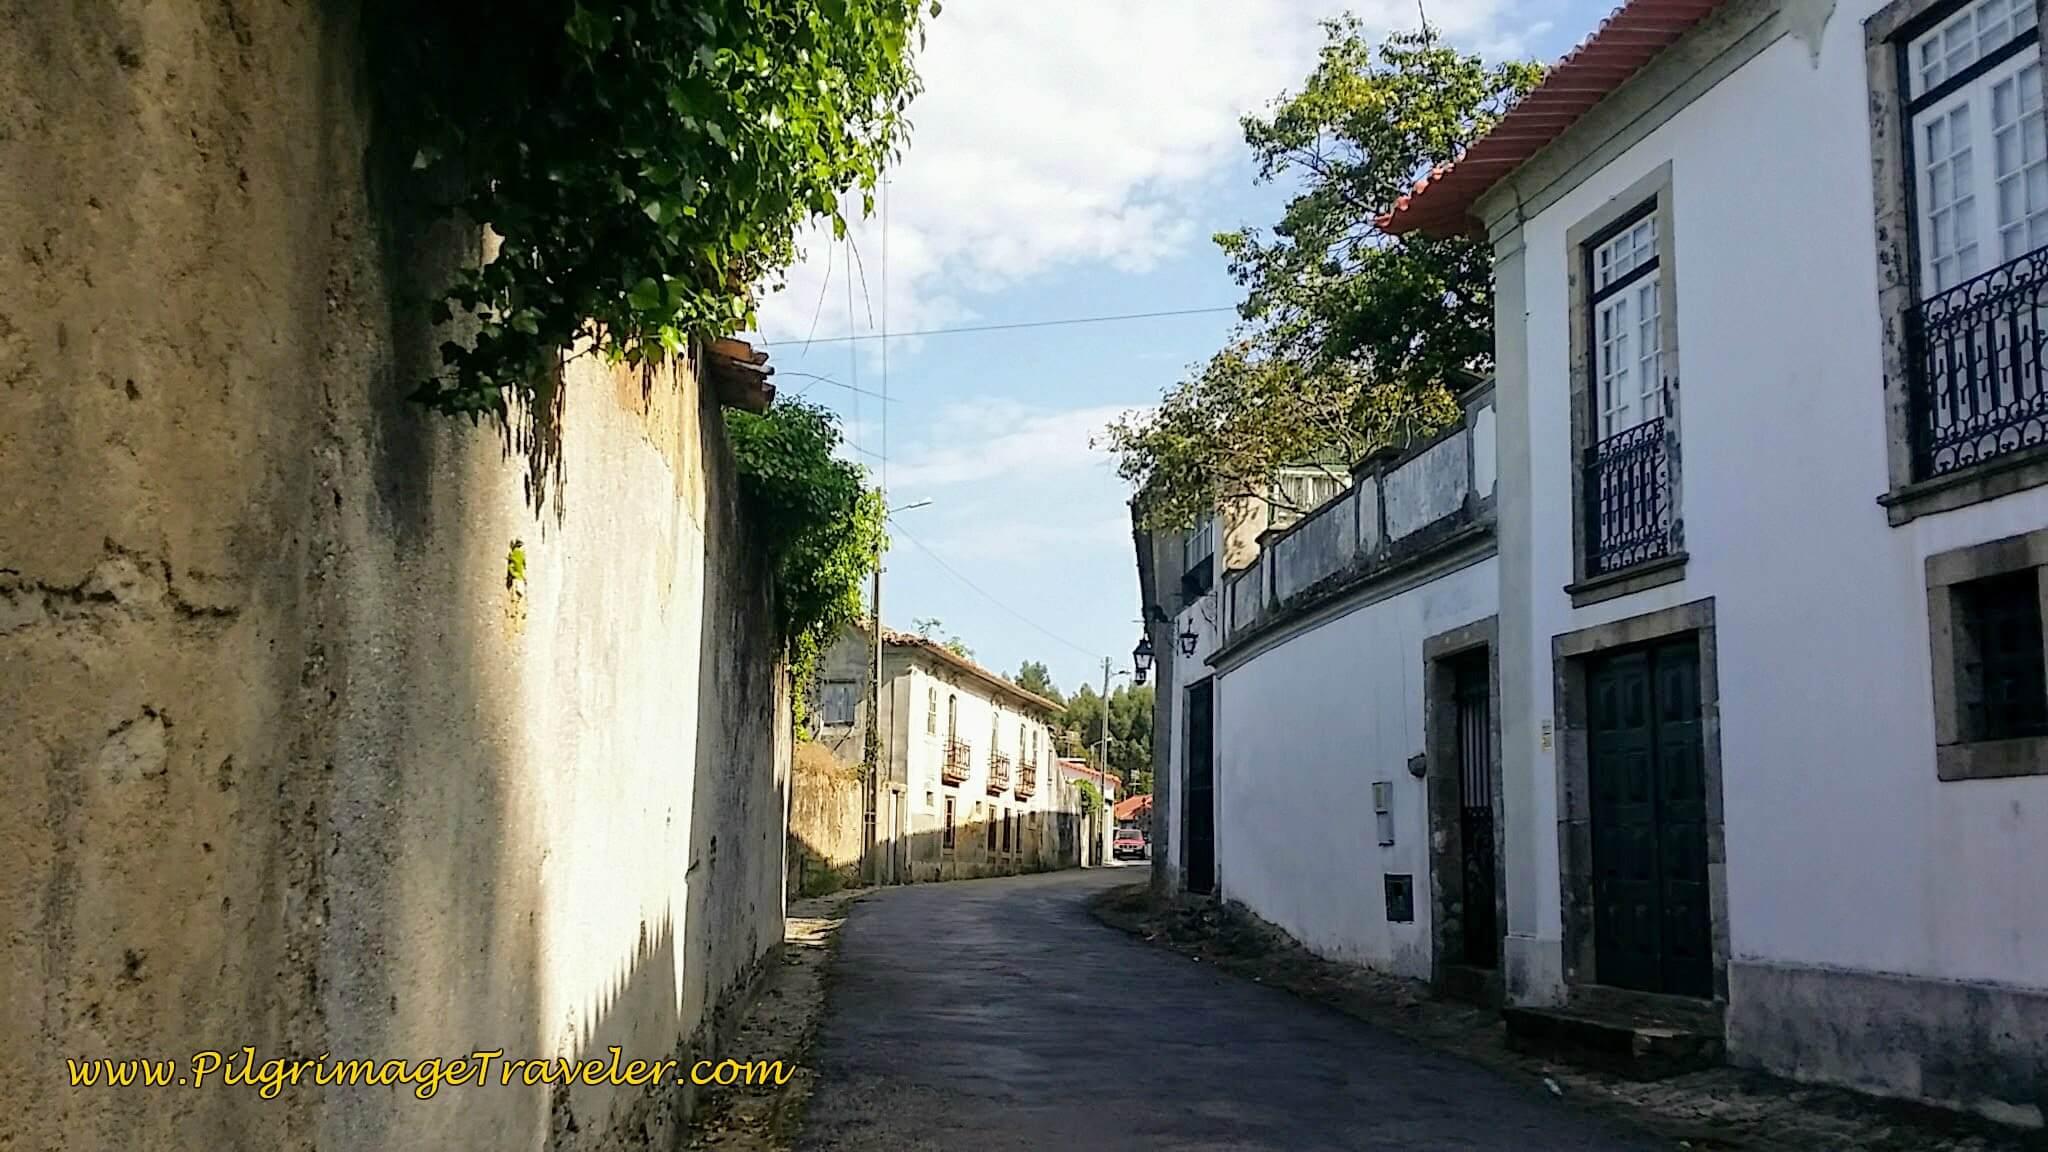 The Narrow Rua Dom Manuel on the Portuguese Way